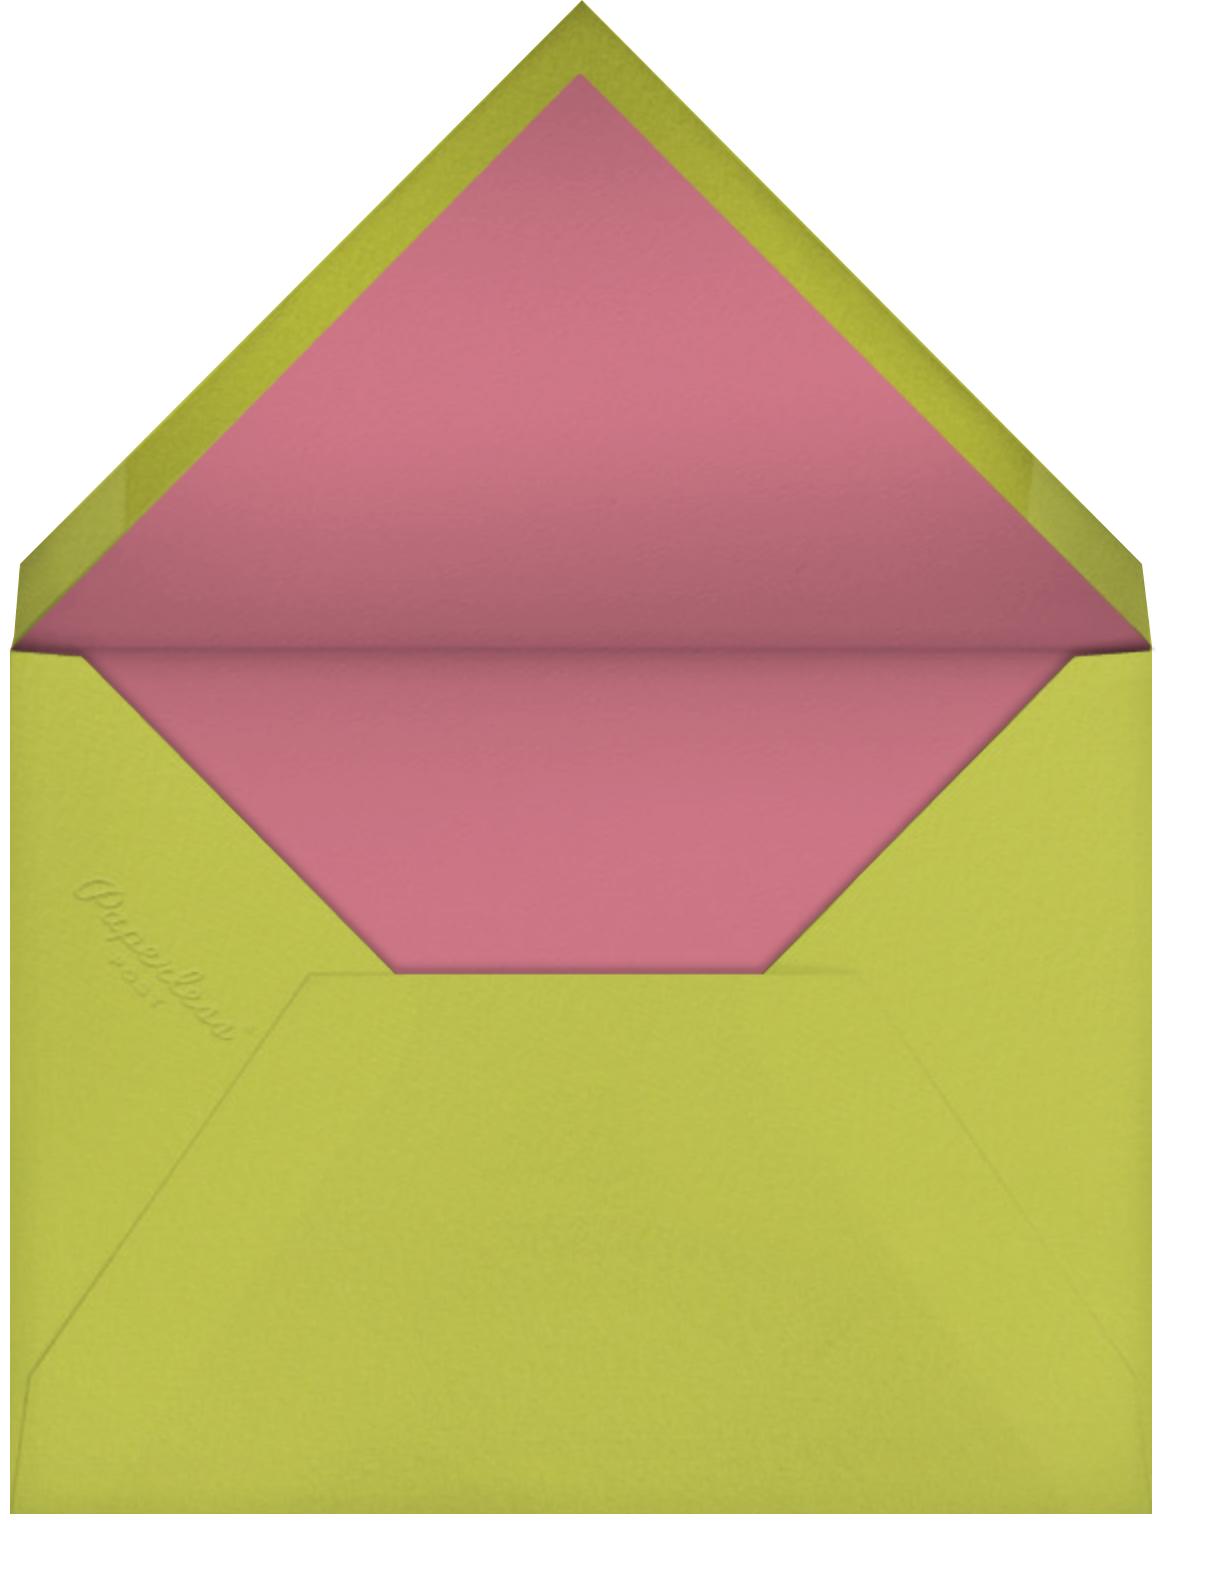 Snappy Birthday (Nicholas John Frith) - Red Cap Cards - Birthday - envelope back